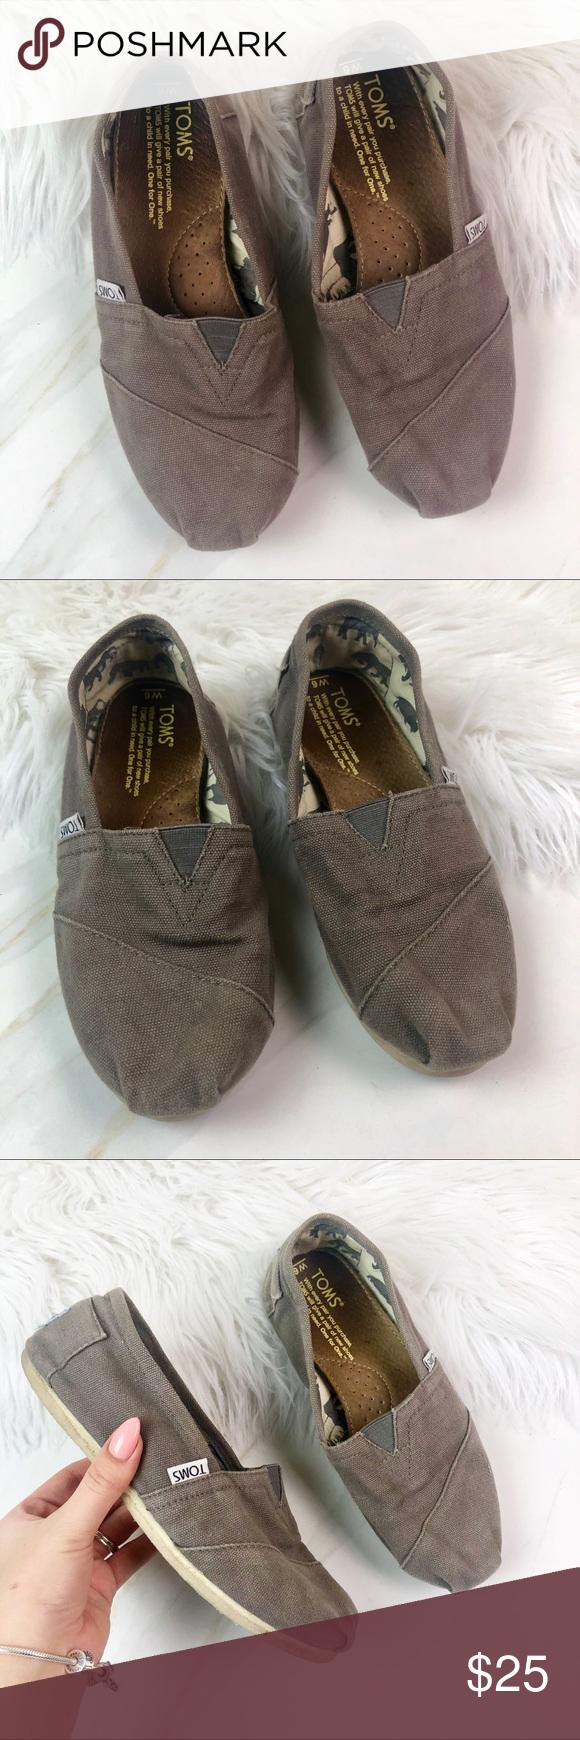 4 For 25 Gray Basic Toms Flat Shoes Women Womens Toms Women Shoes